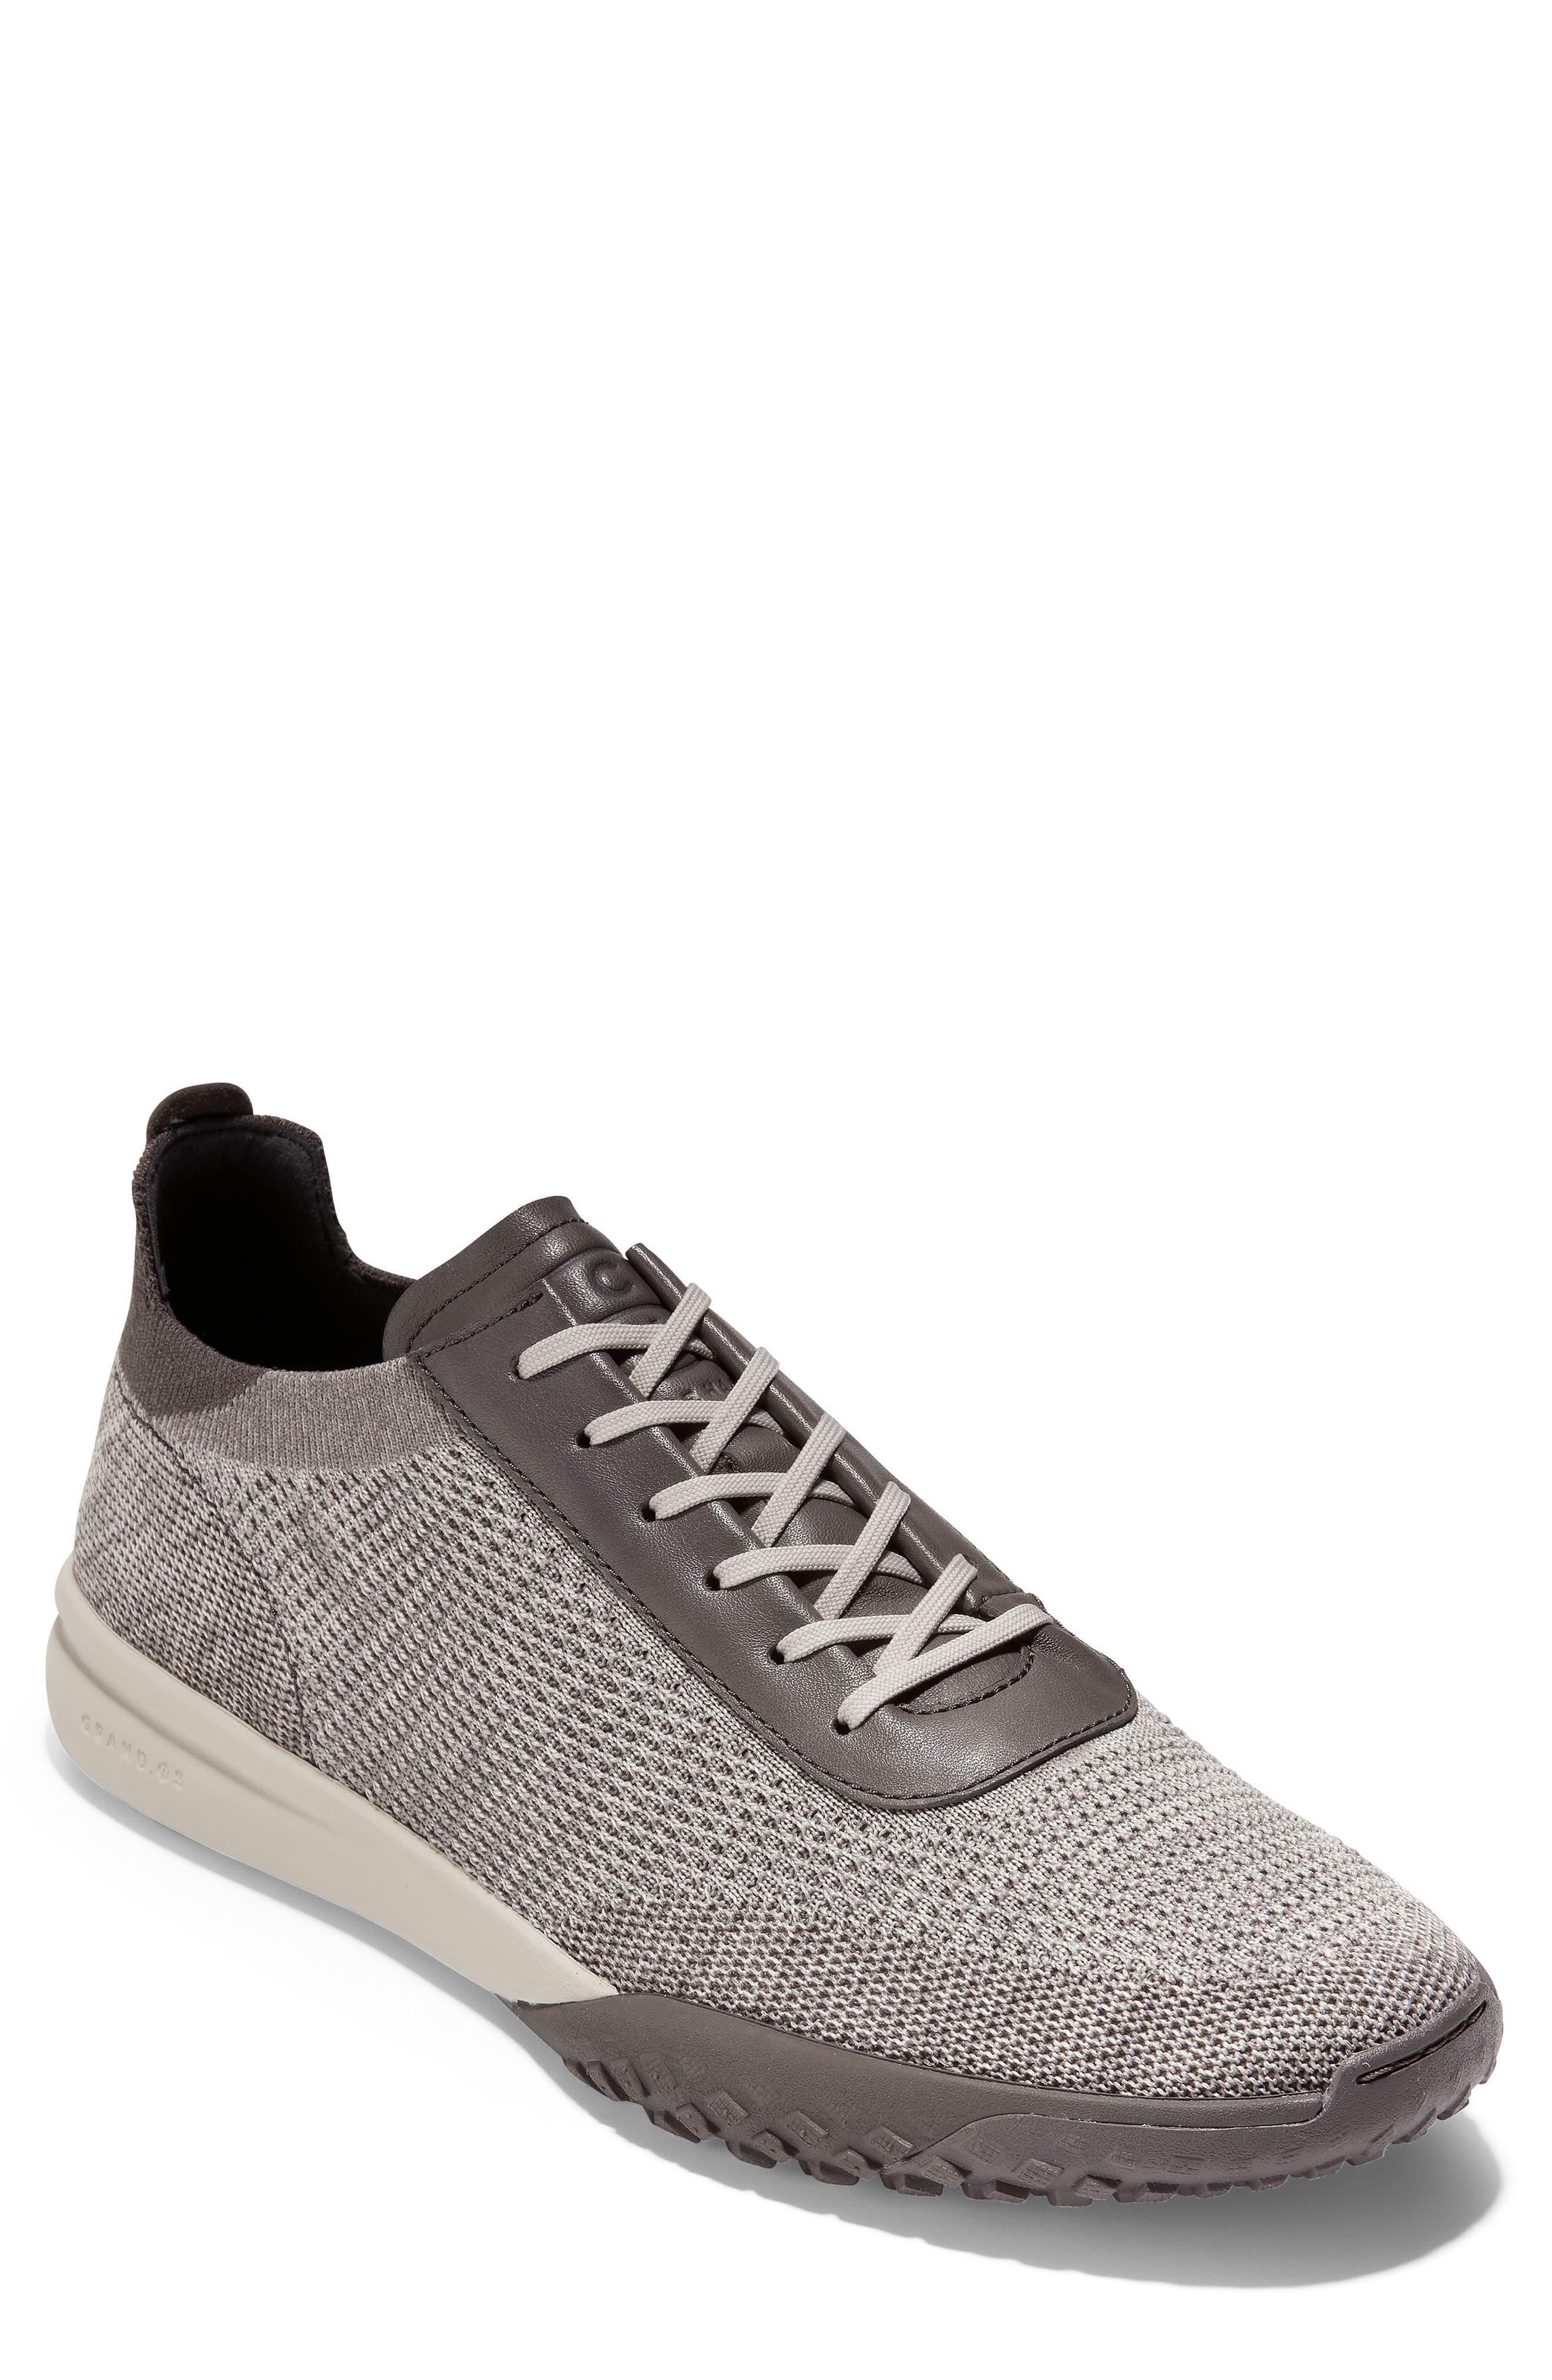 GrandPro Trail Low Stitchlite Sneaker,                             Main thumbnail 1, color,                             BLACK/ VAPOR GREY KNIT